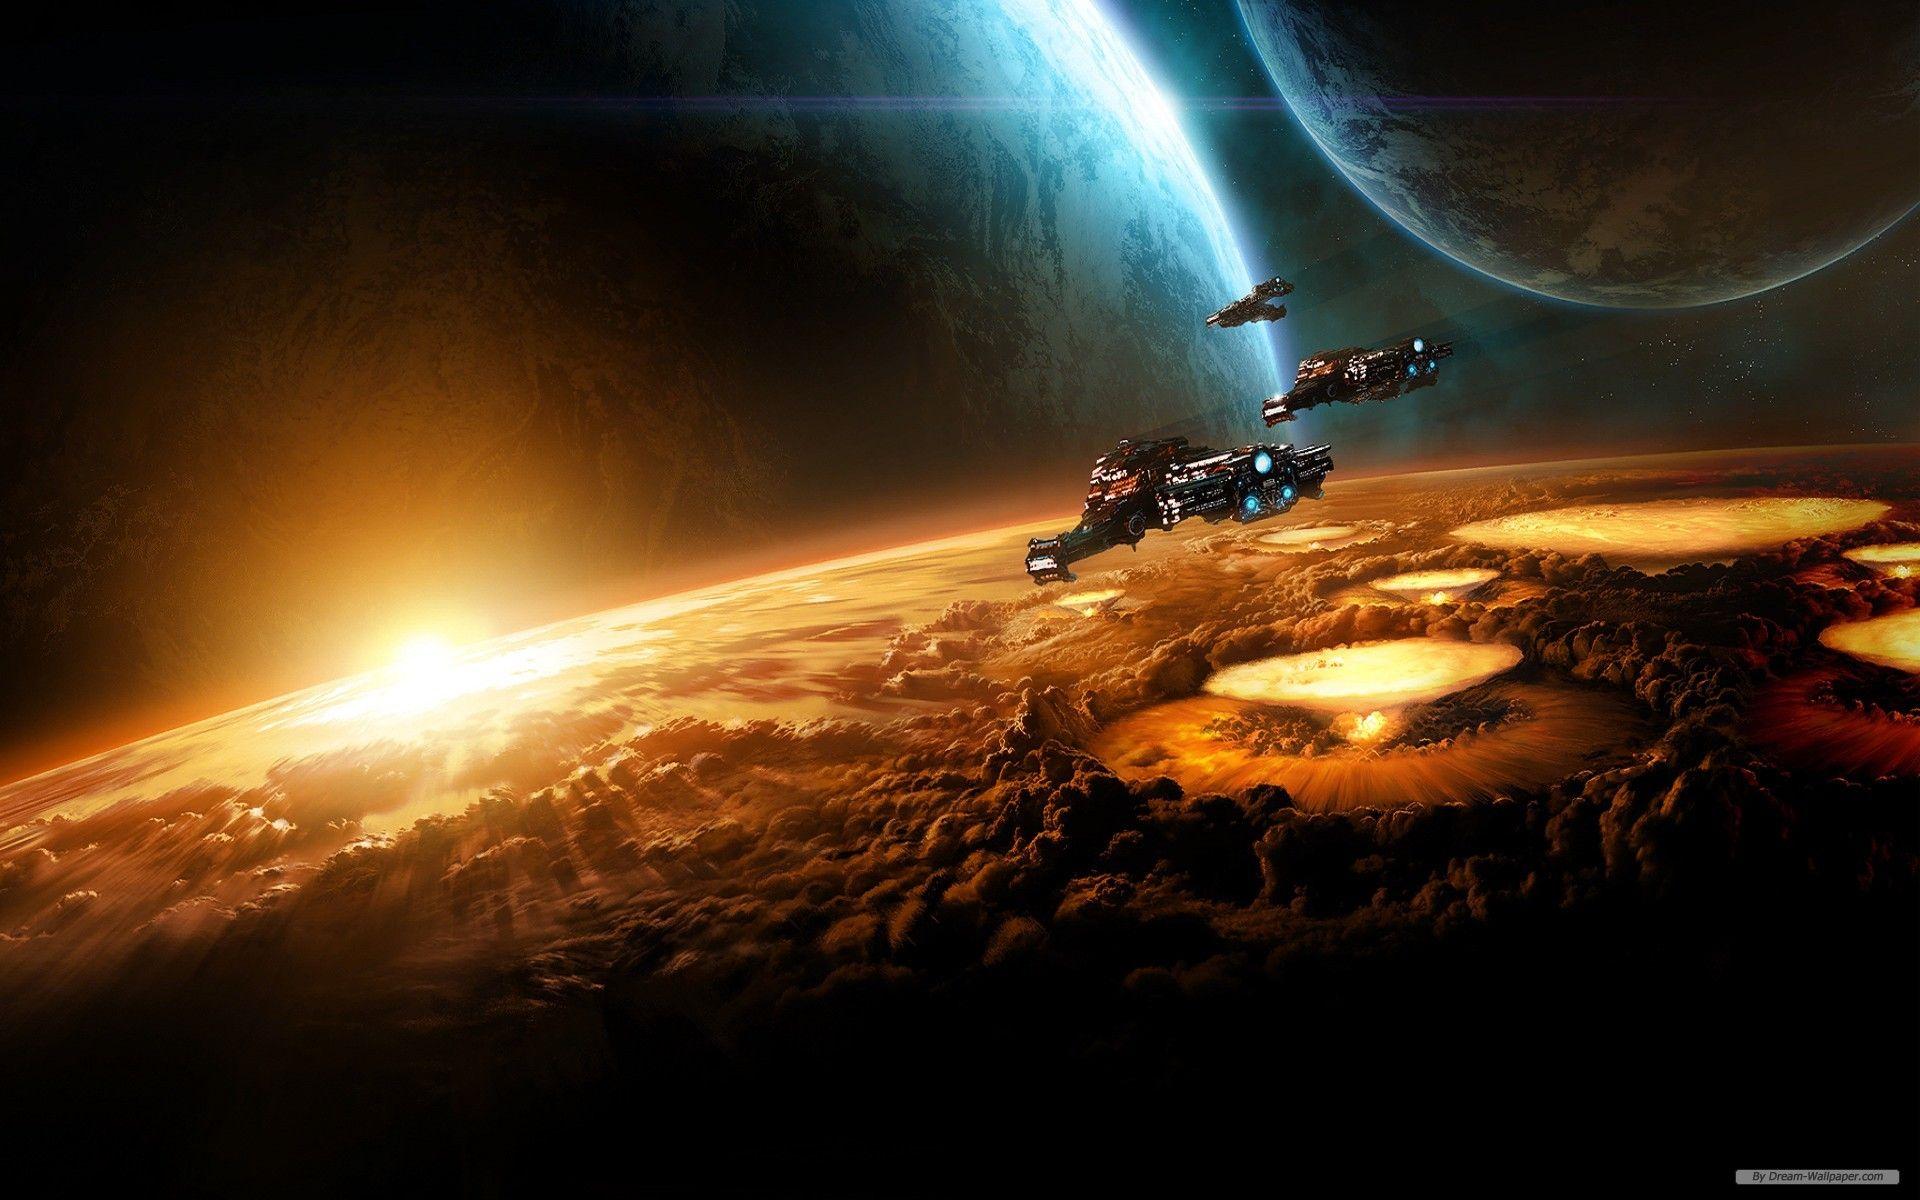 Spaceships Over The Horizon 1920 X 1200 Background Hd Wallpaper Starcraft Hd Wallpaper